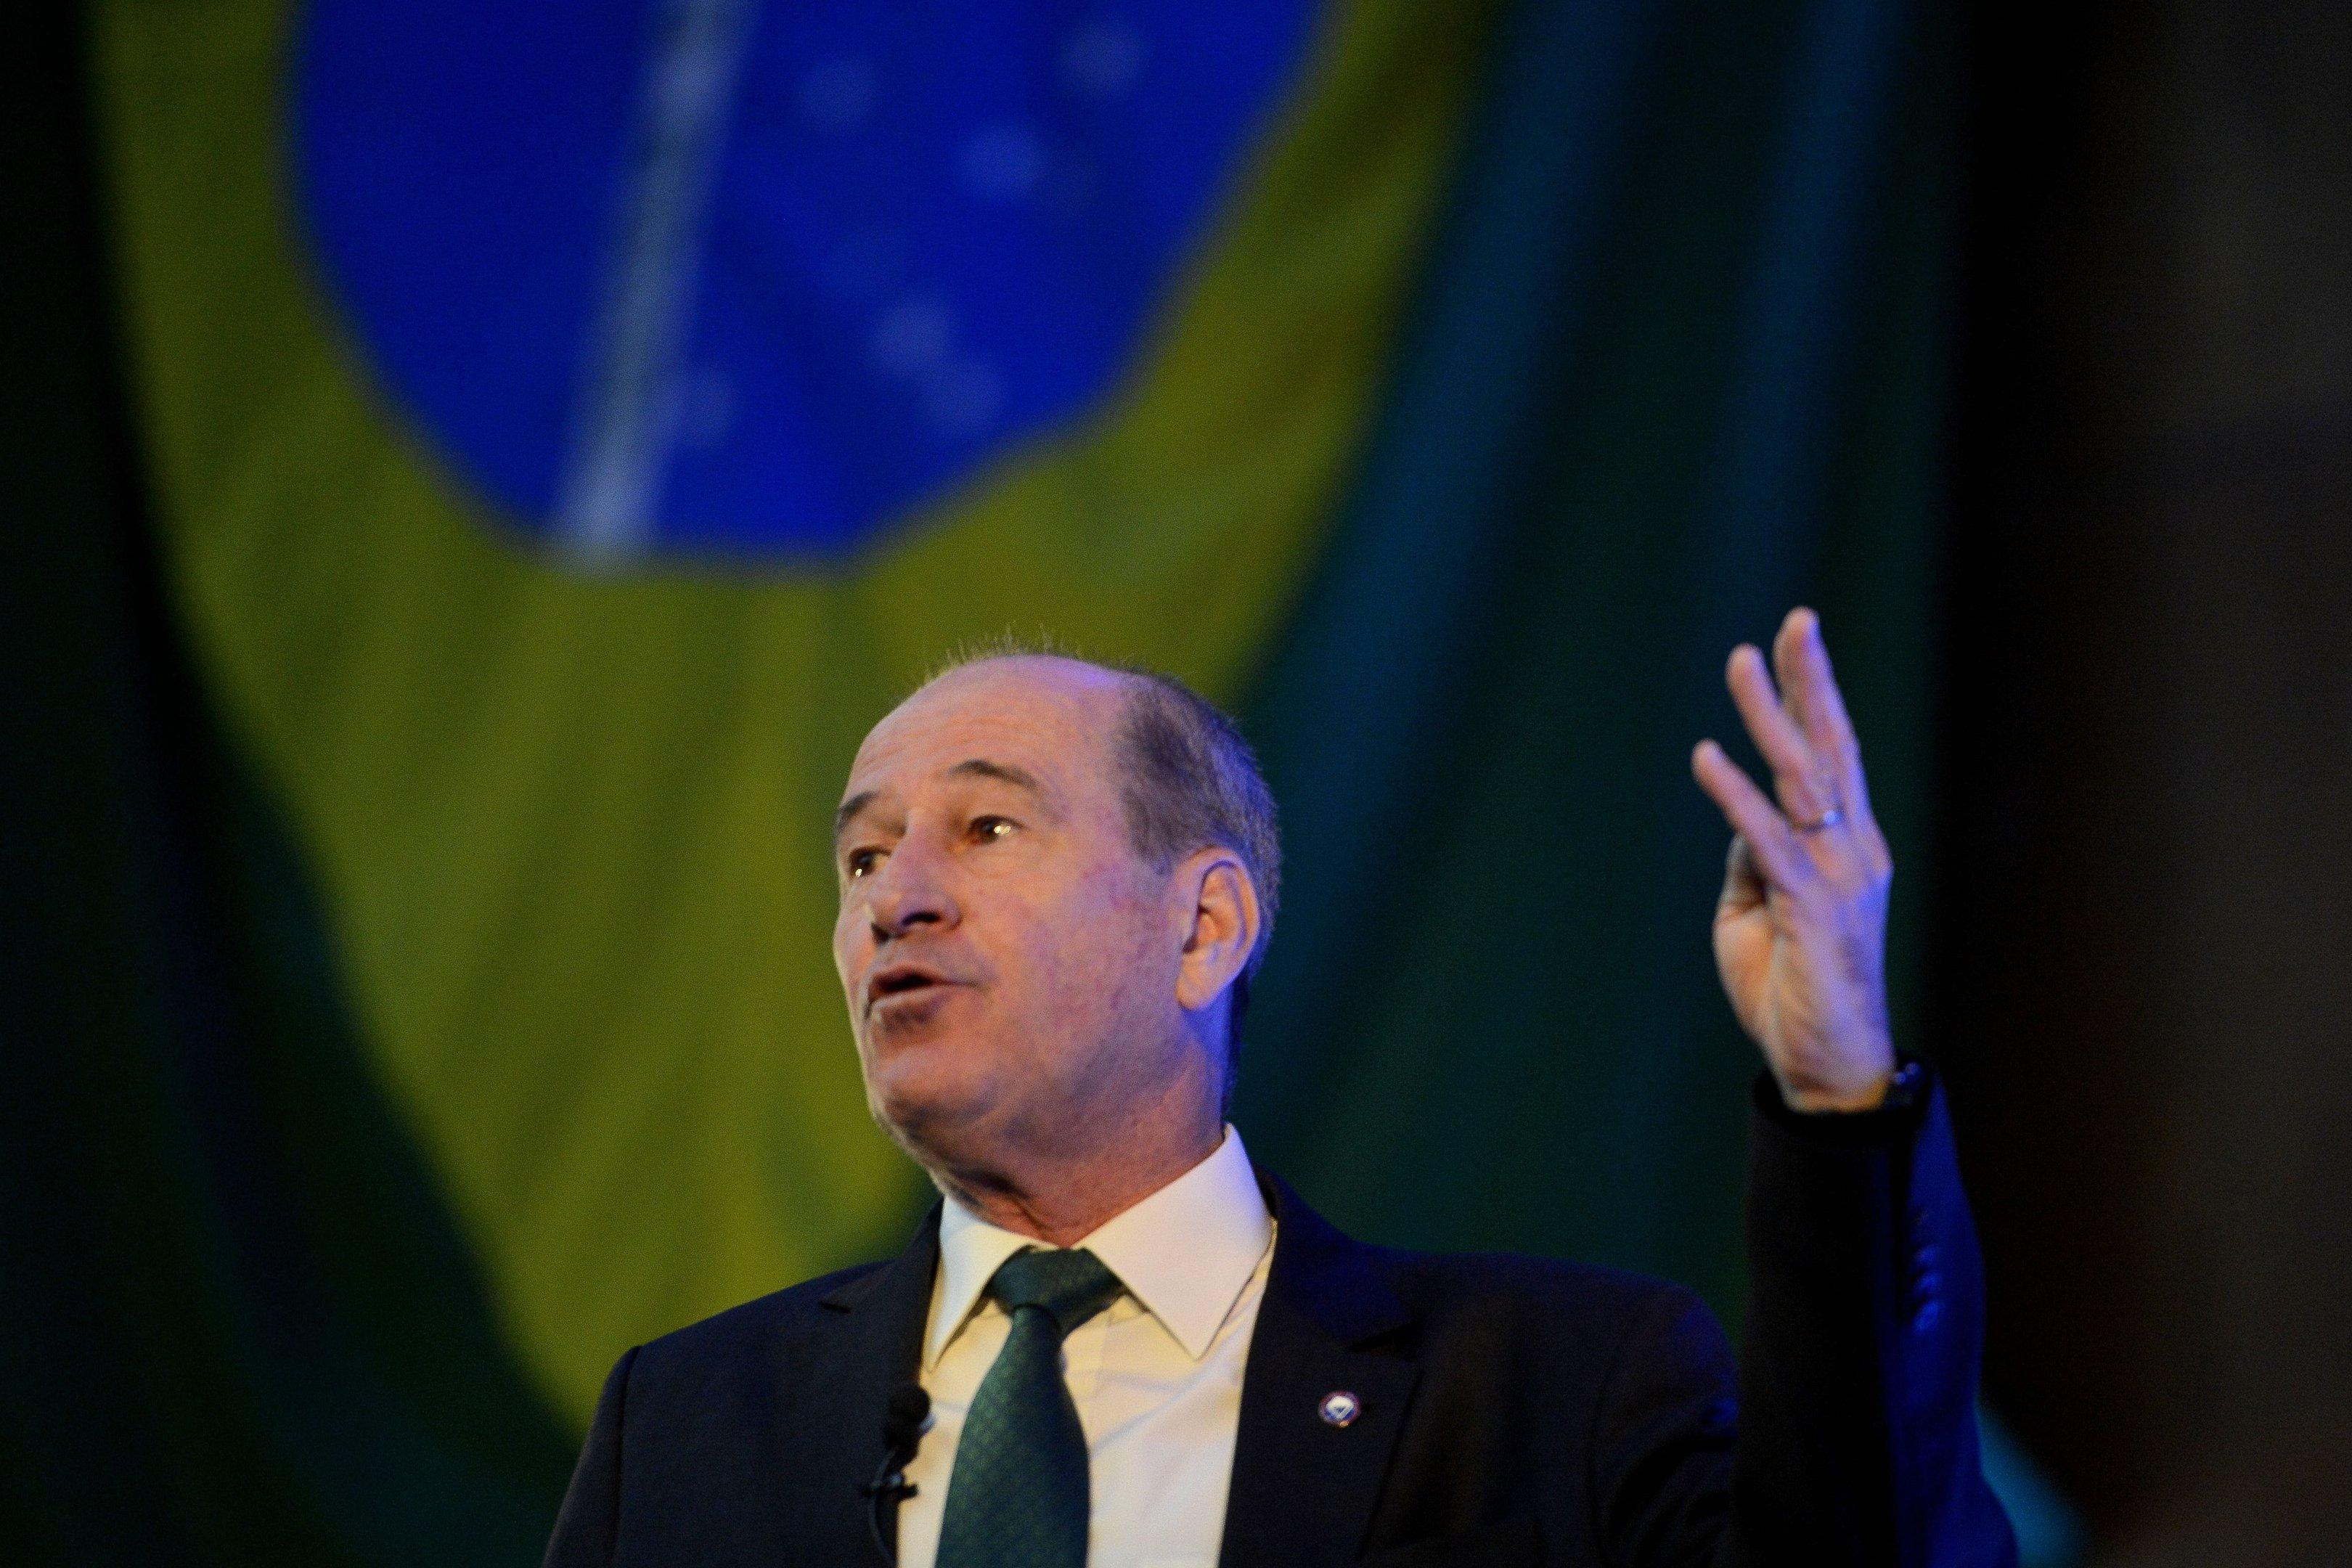 ministro da Defesa, Fernando Azevedo e Silva